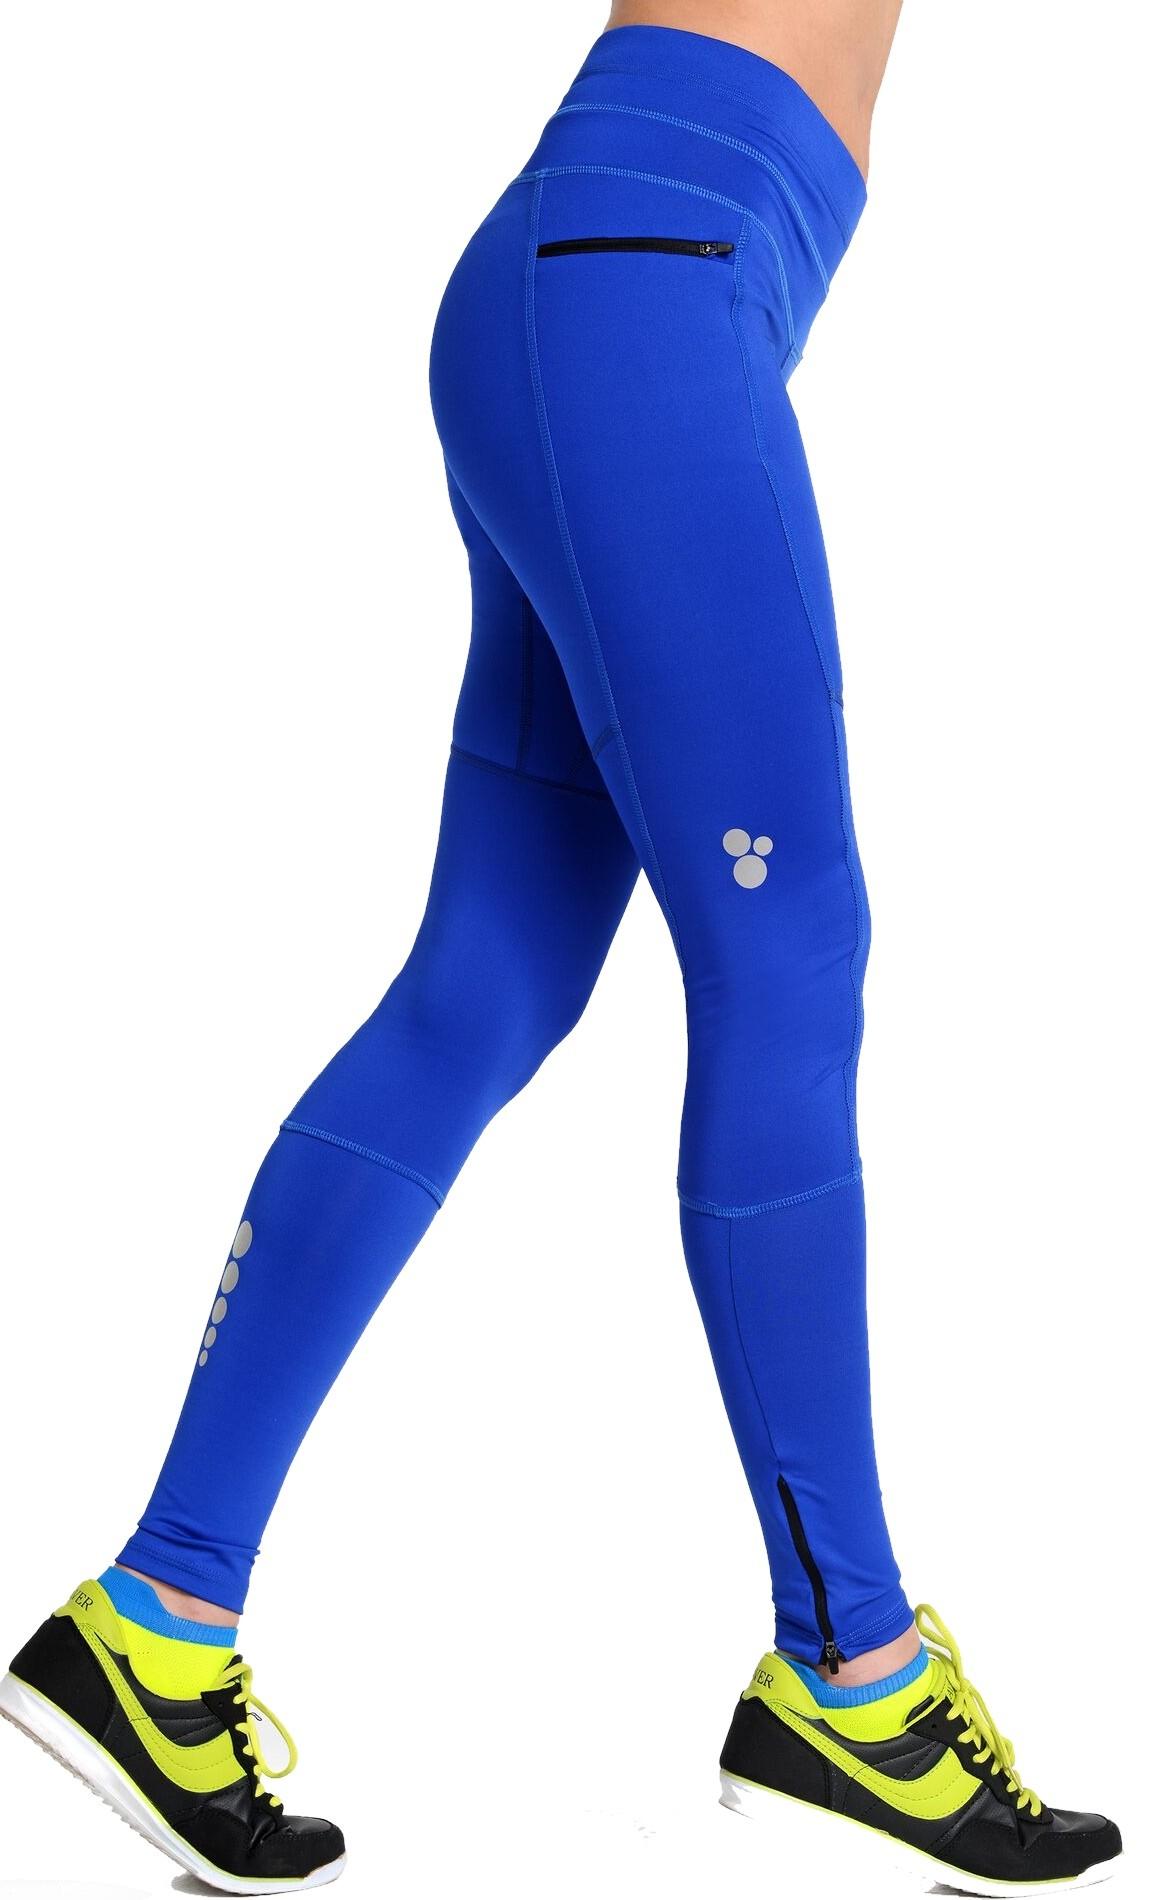 sport leggings damen luxus damen strickleggings leggings strick sport leggings hot damen. Black Bedroom Furniture Sets. Home Design Ideas